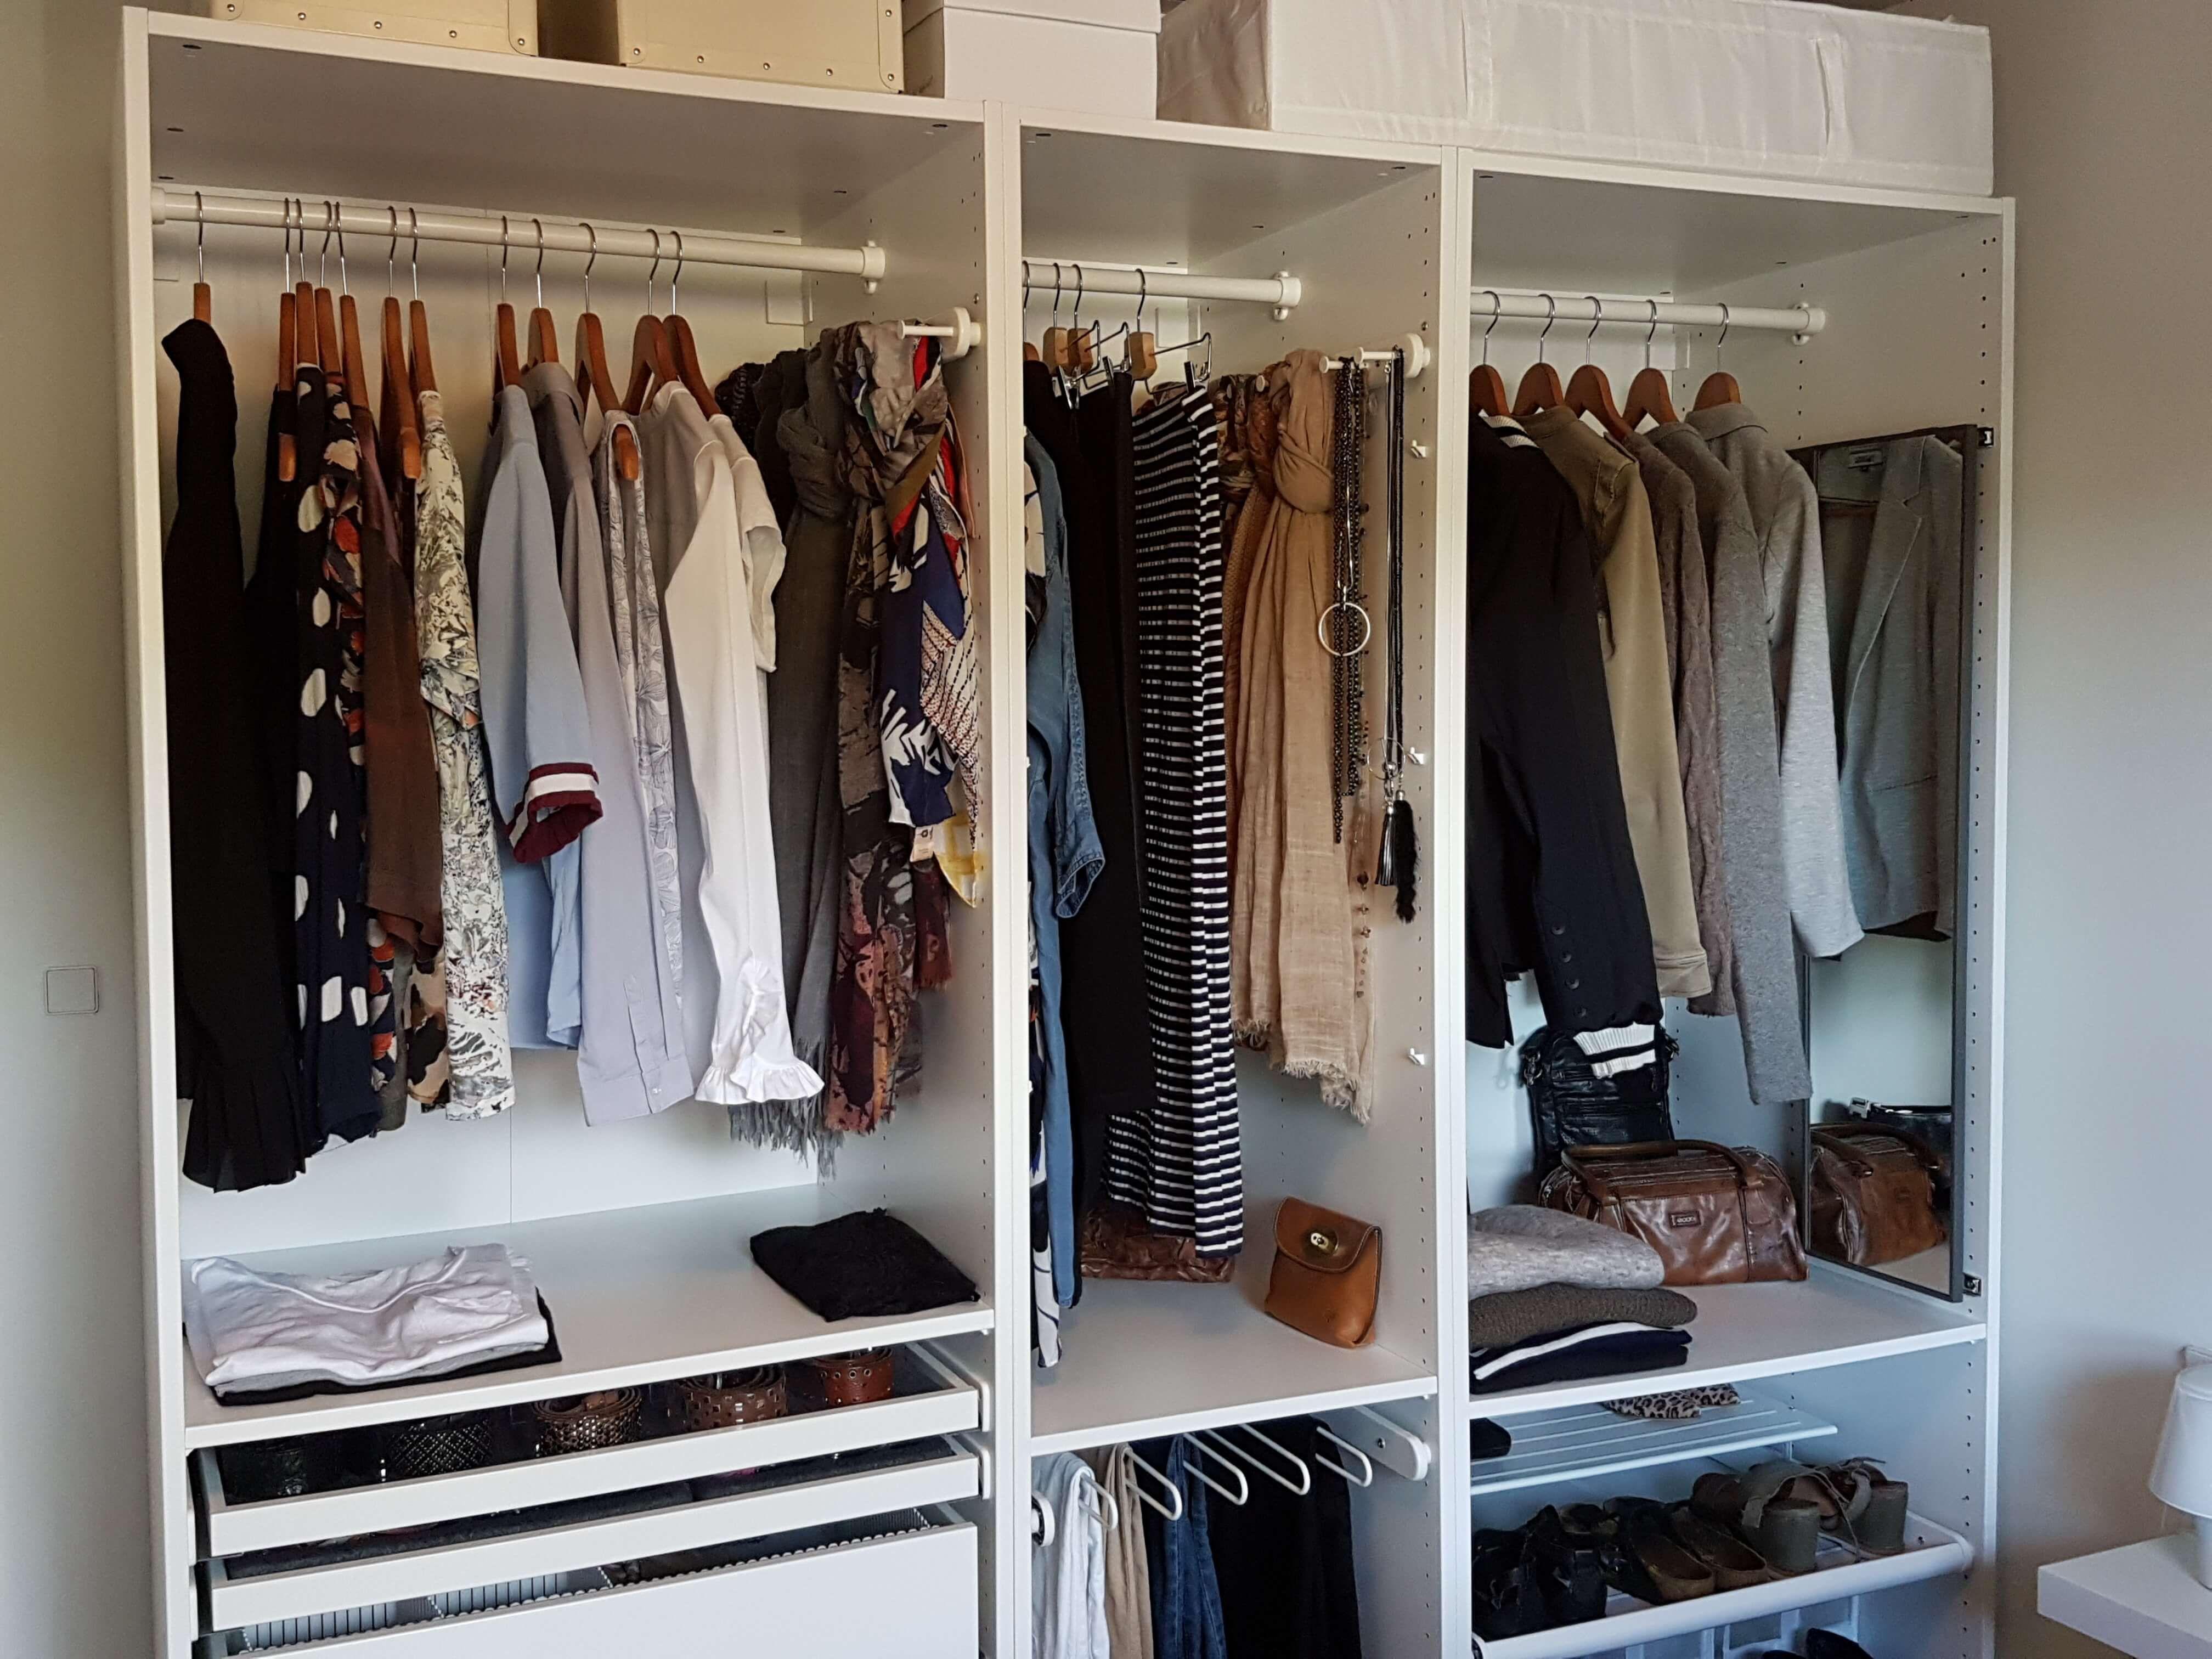 Hvordan bygger man en kapsel garderobe?   betinaschou.dk ...